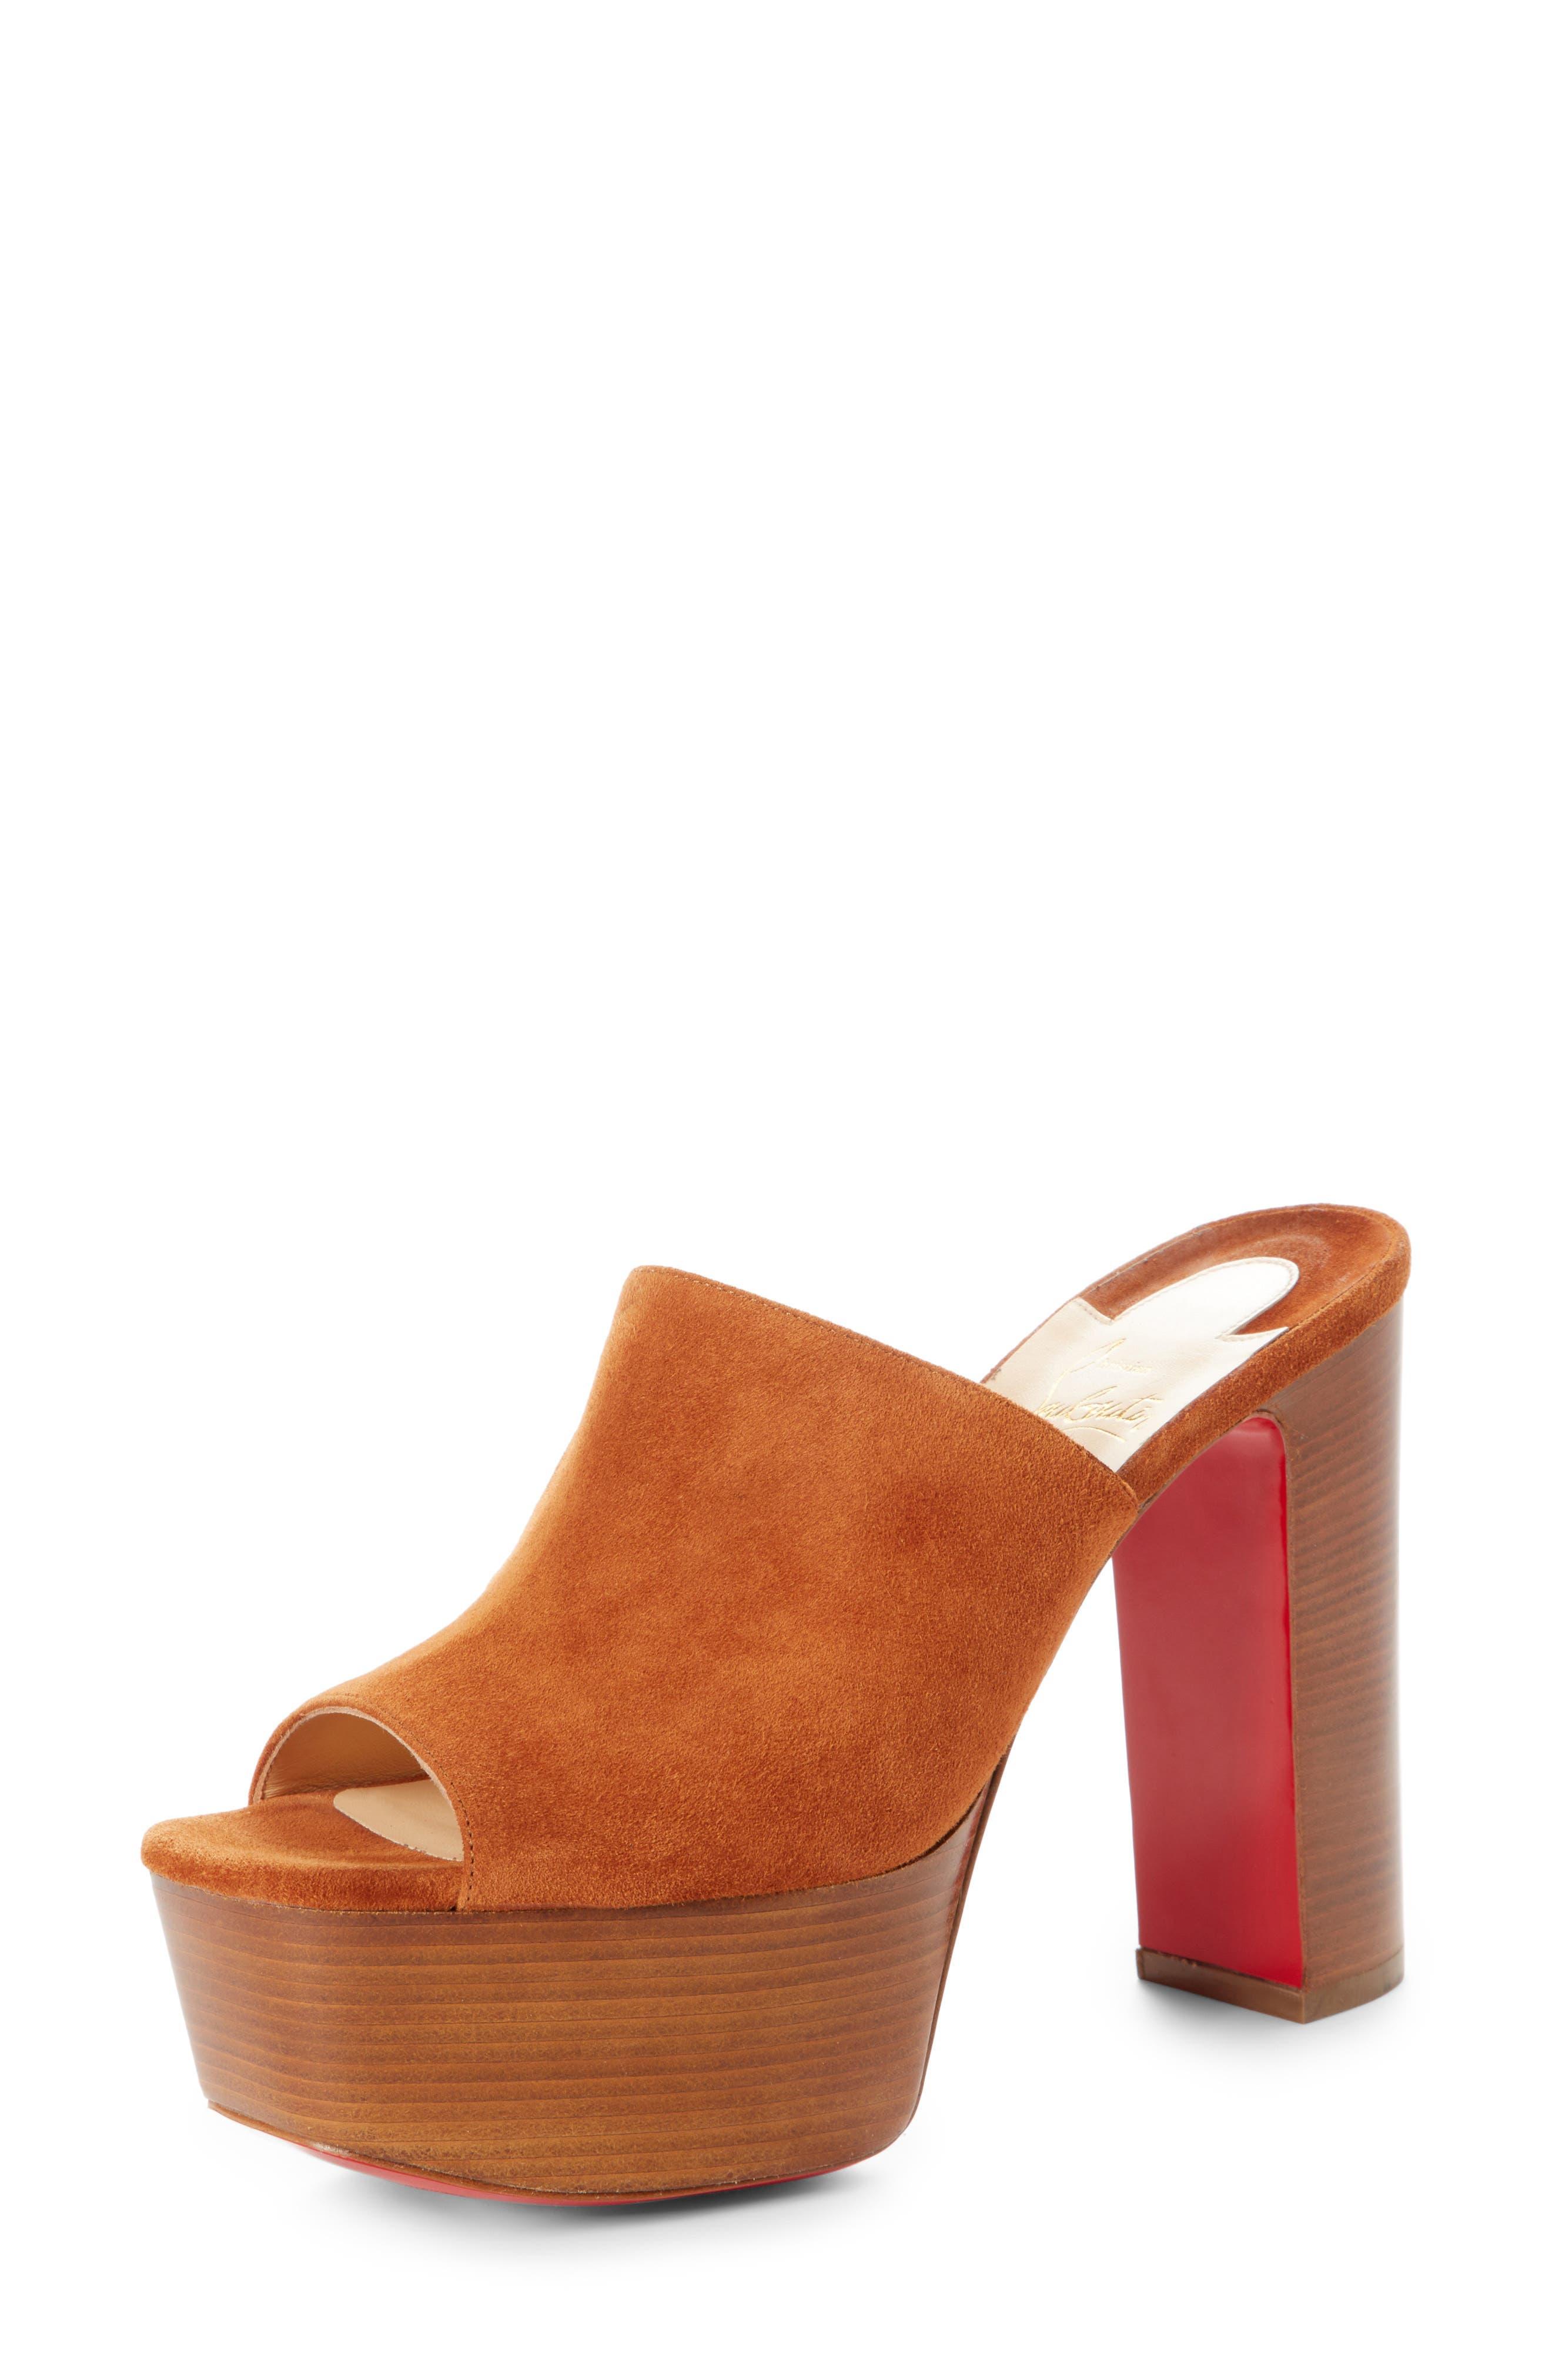 Main Image - Christian Louboutin Suede Platform Mule Sandal (Women)